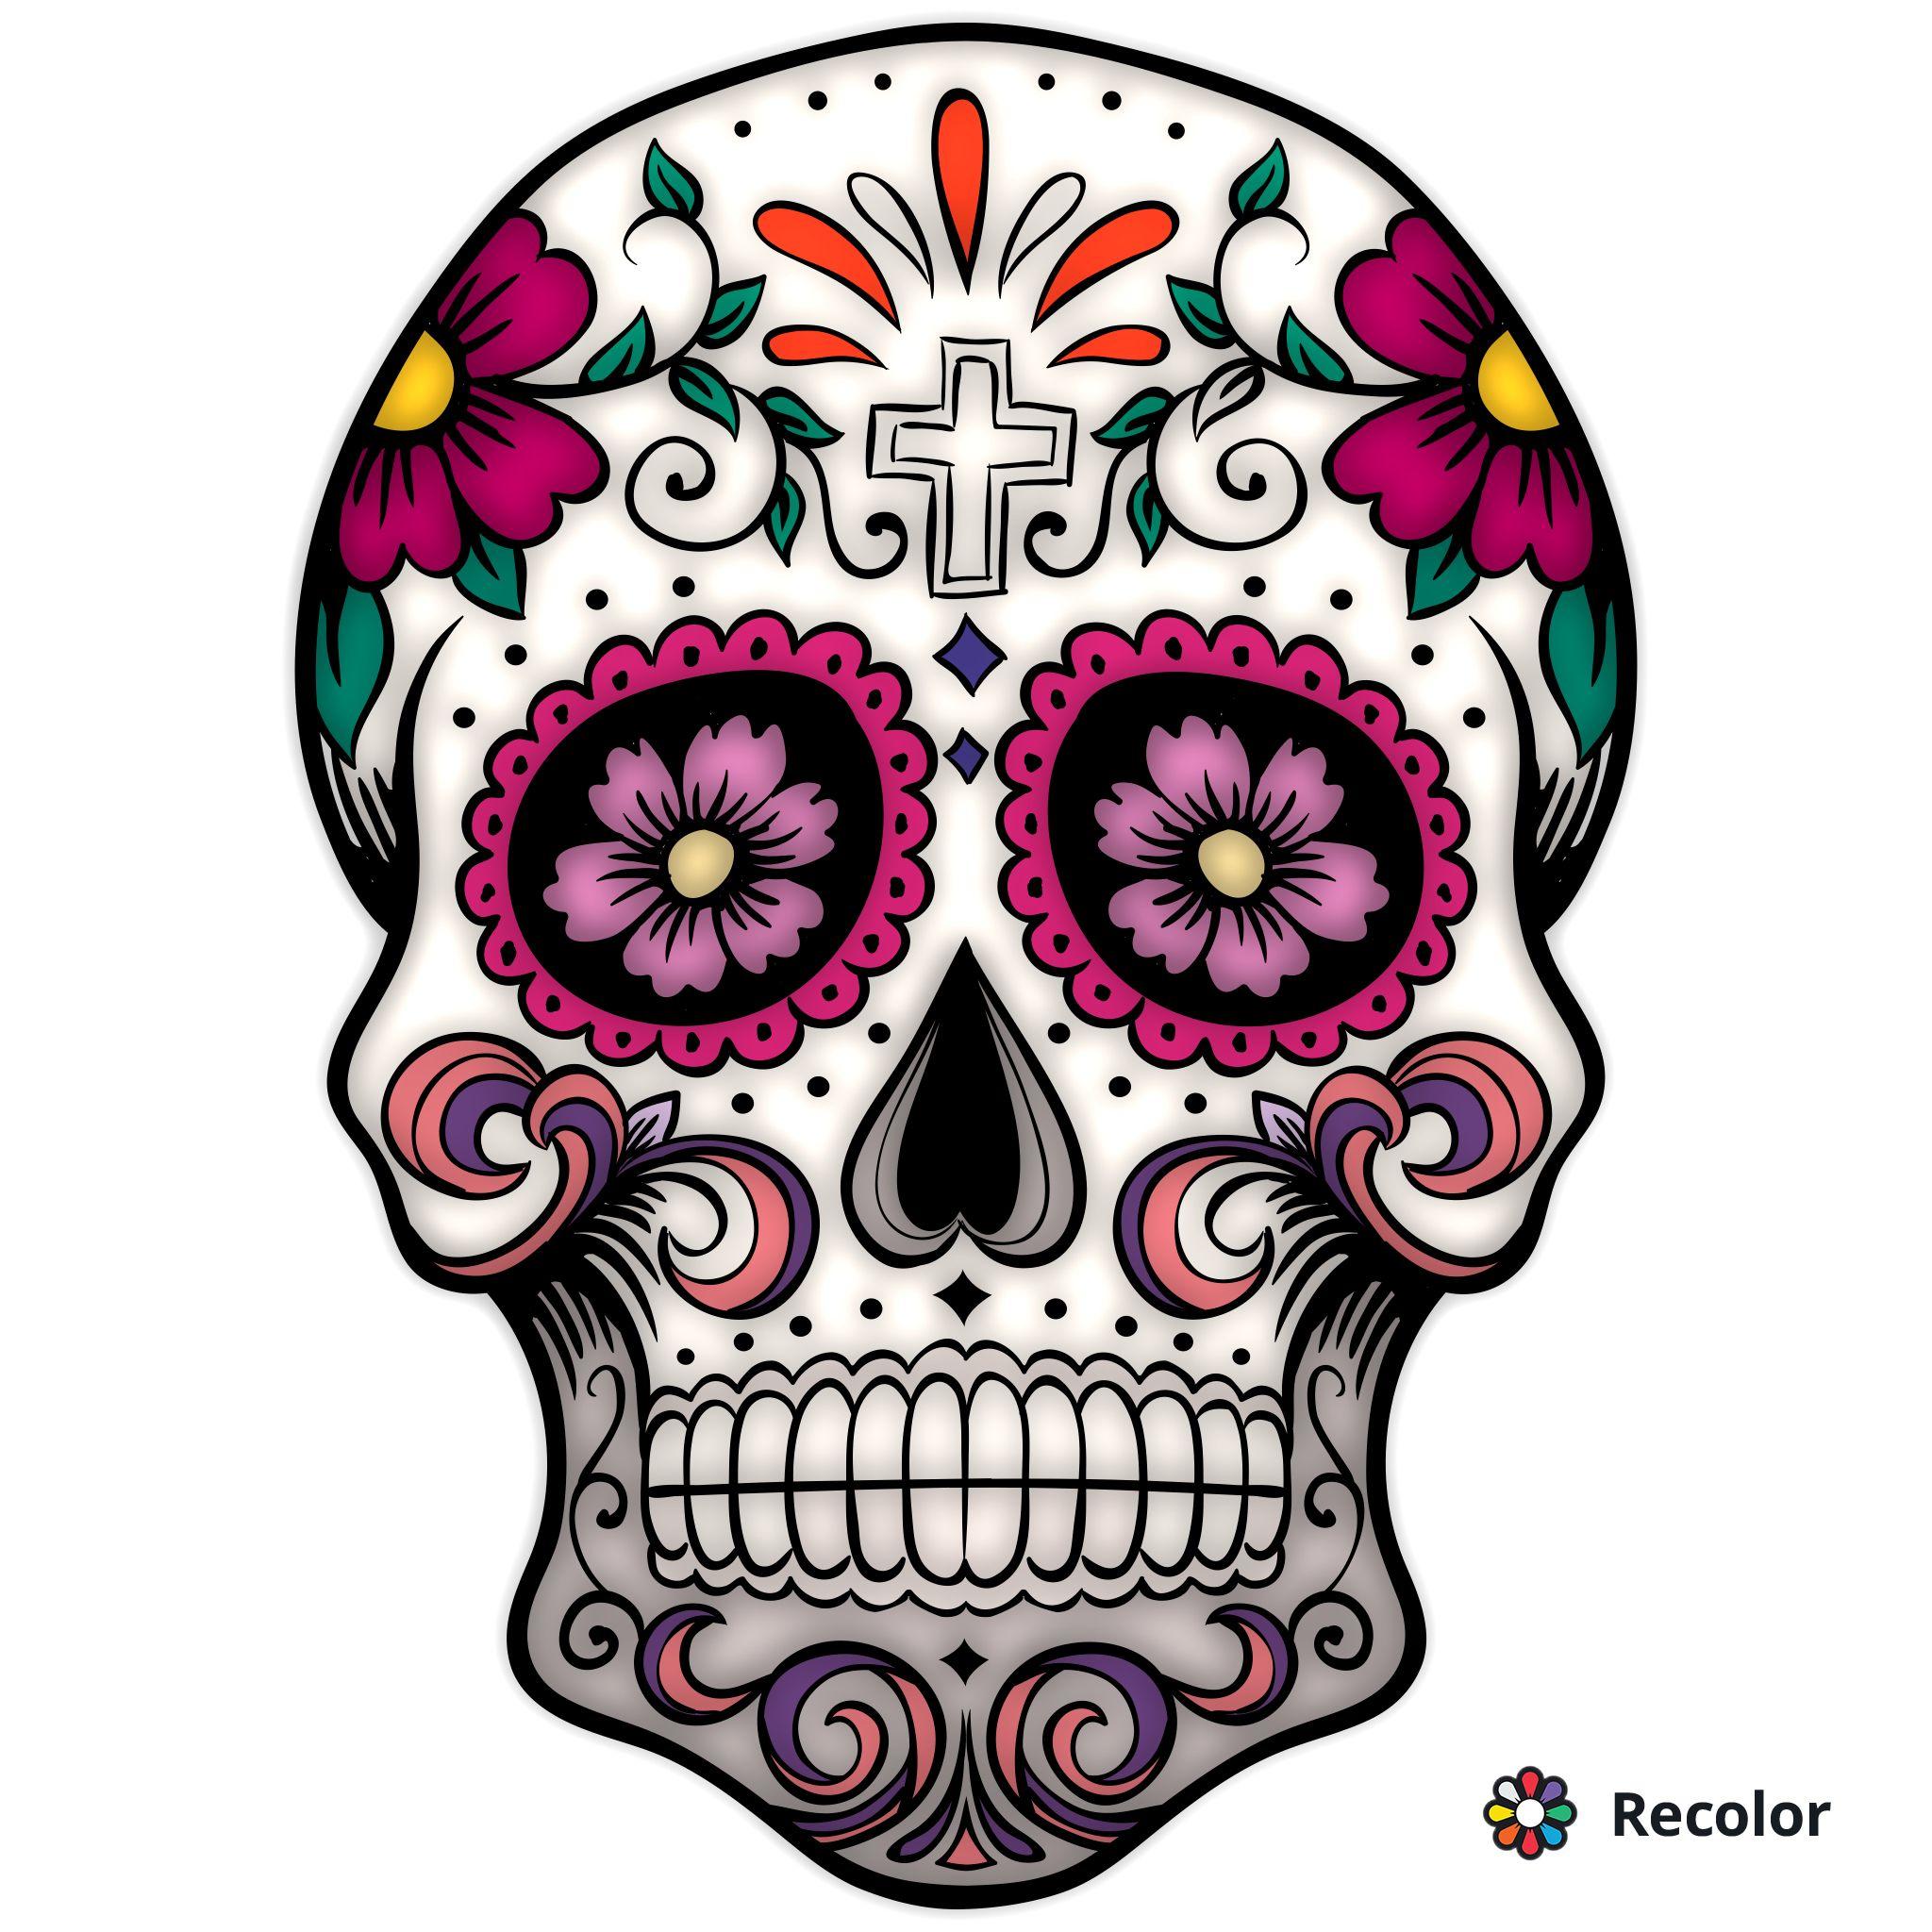 recolor #app | The wonders of art | Pinterest